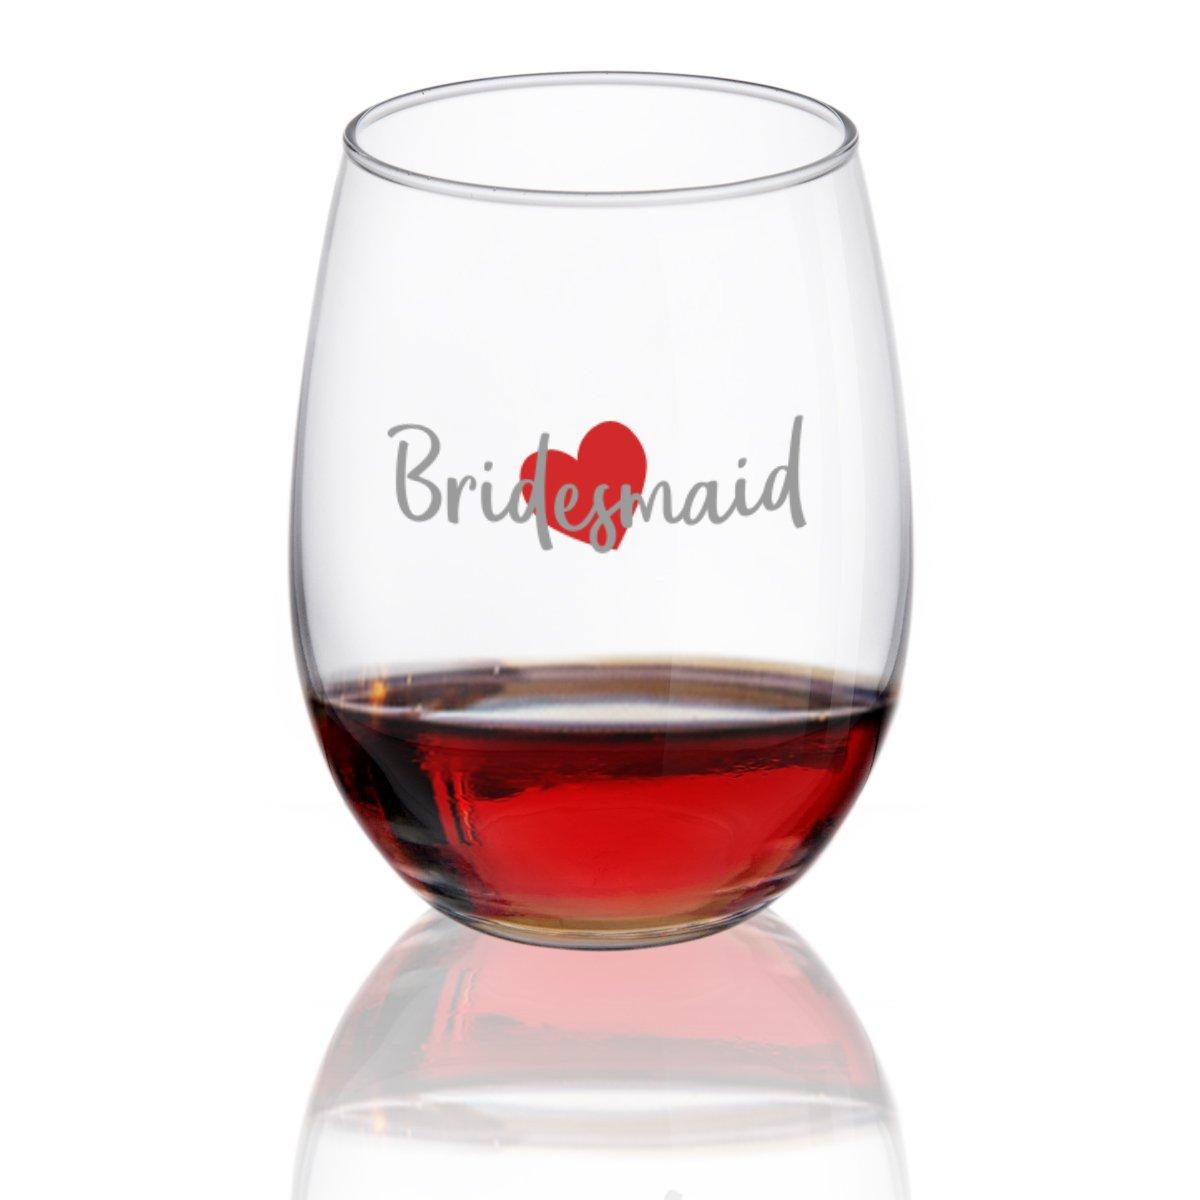 Bridesmaid Wine Glasstemless Wine Glasses for Bride Tribe